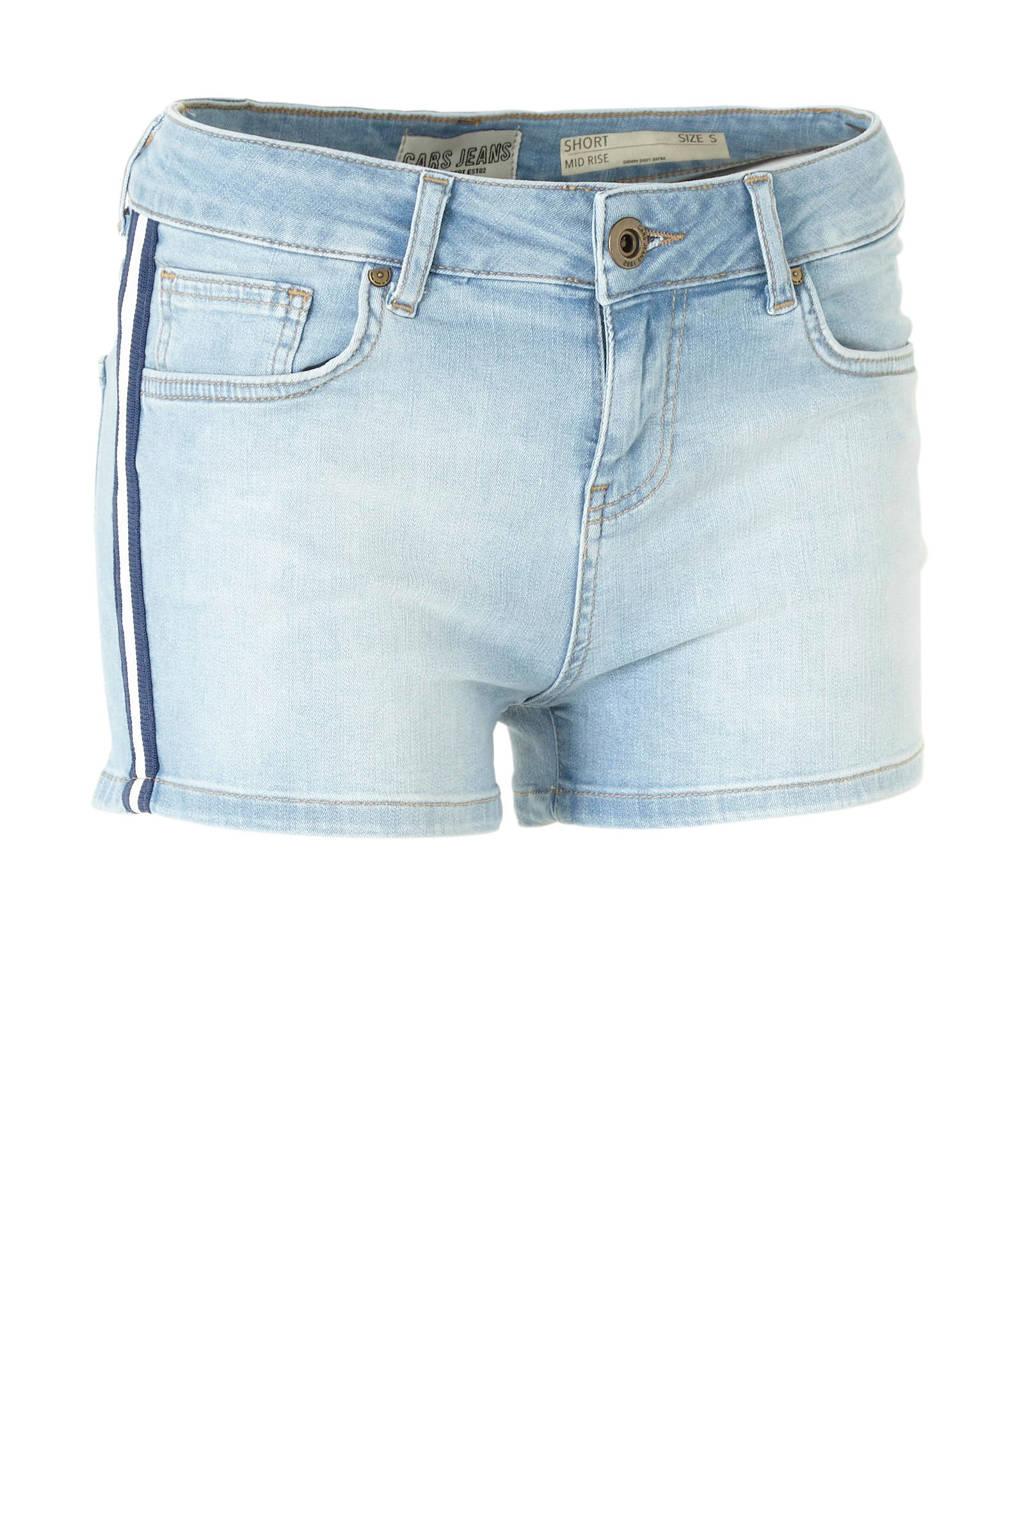 Cars slim fit jeans short Strippa met zijstreep, Blauw